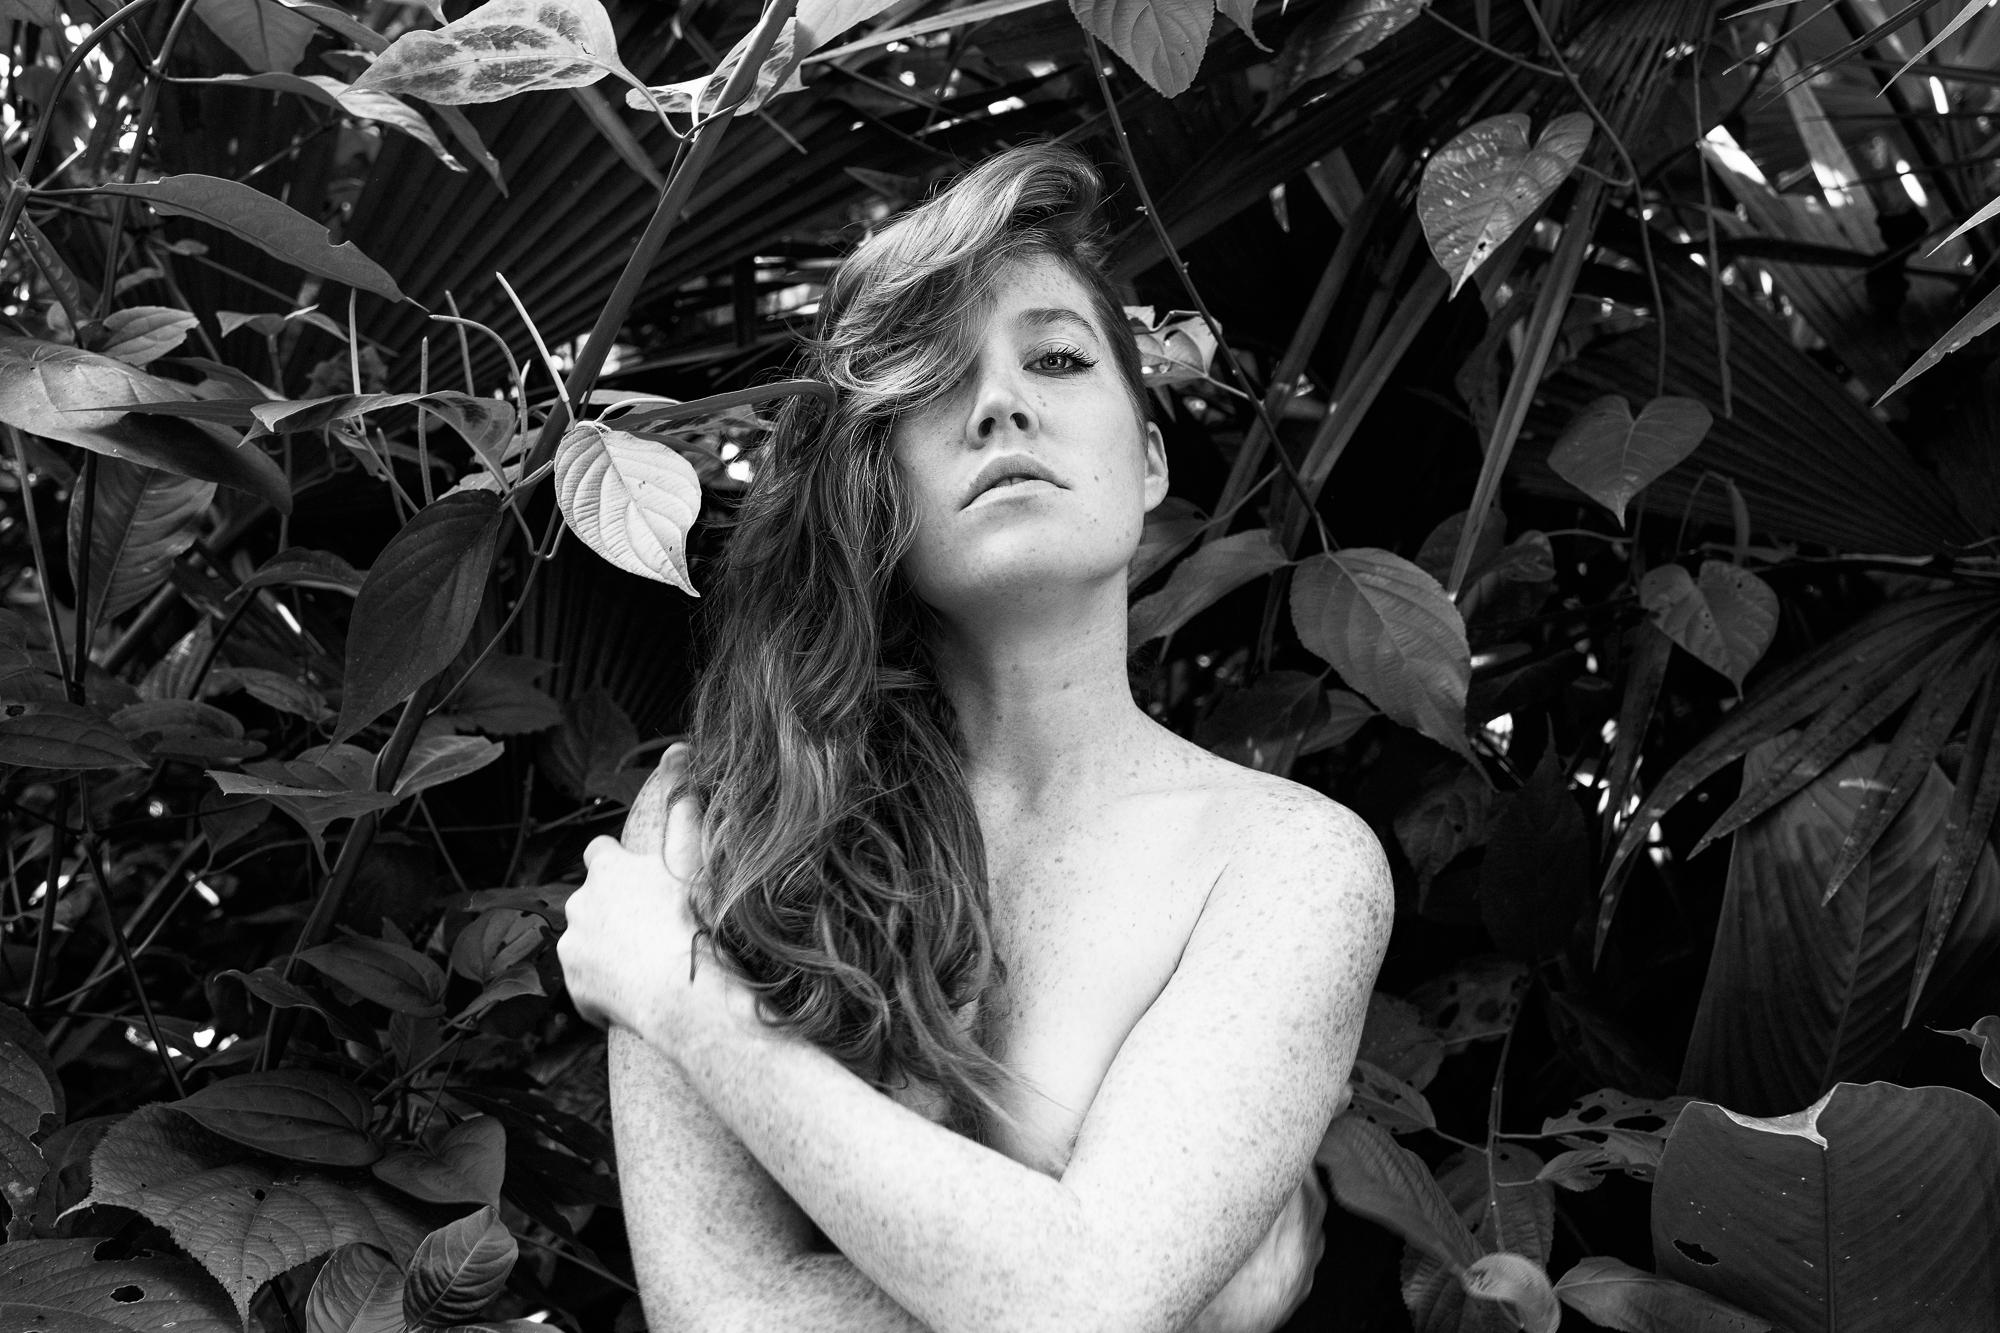 20170210-Ariane-Cassidy-Hannah-Amazon-jungle-FUJIFILM-X-Pro2-0074-Edit.jpg